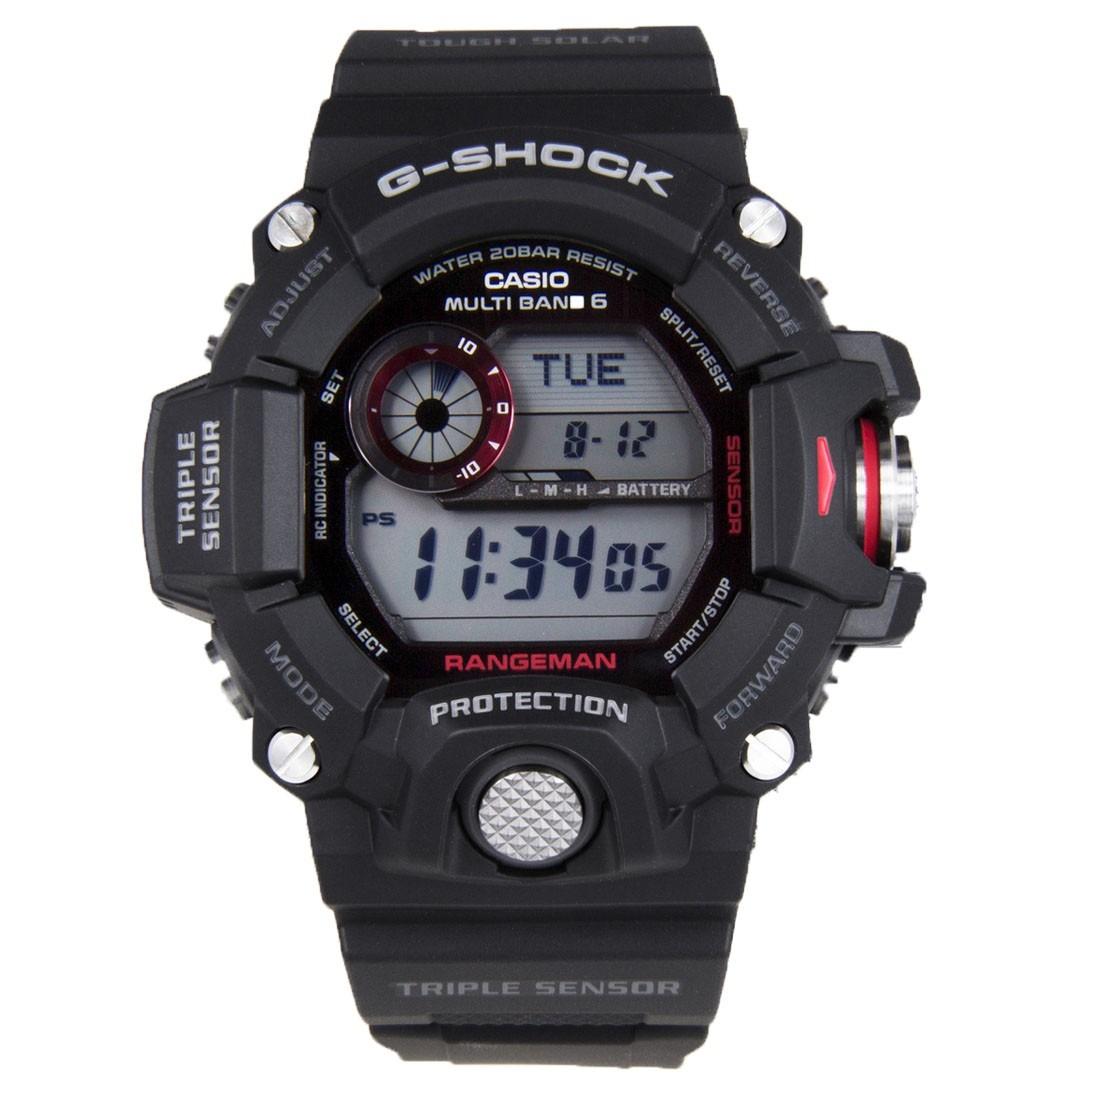 9386d5f84f8e reloj casio g-shock rangeman triple sensor gw-9400-1 solar. Cargando zoom.